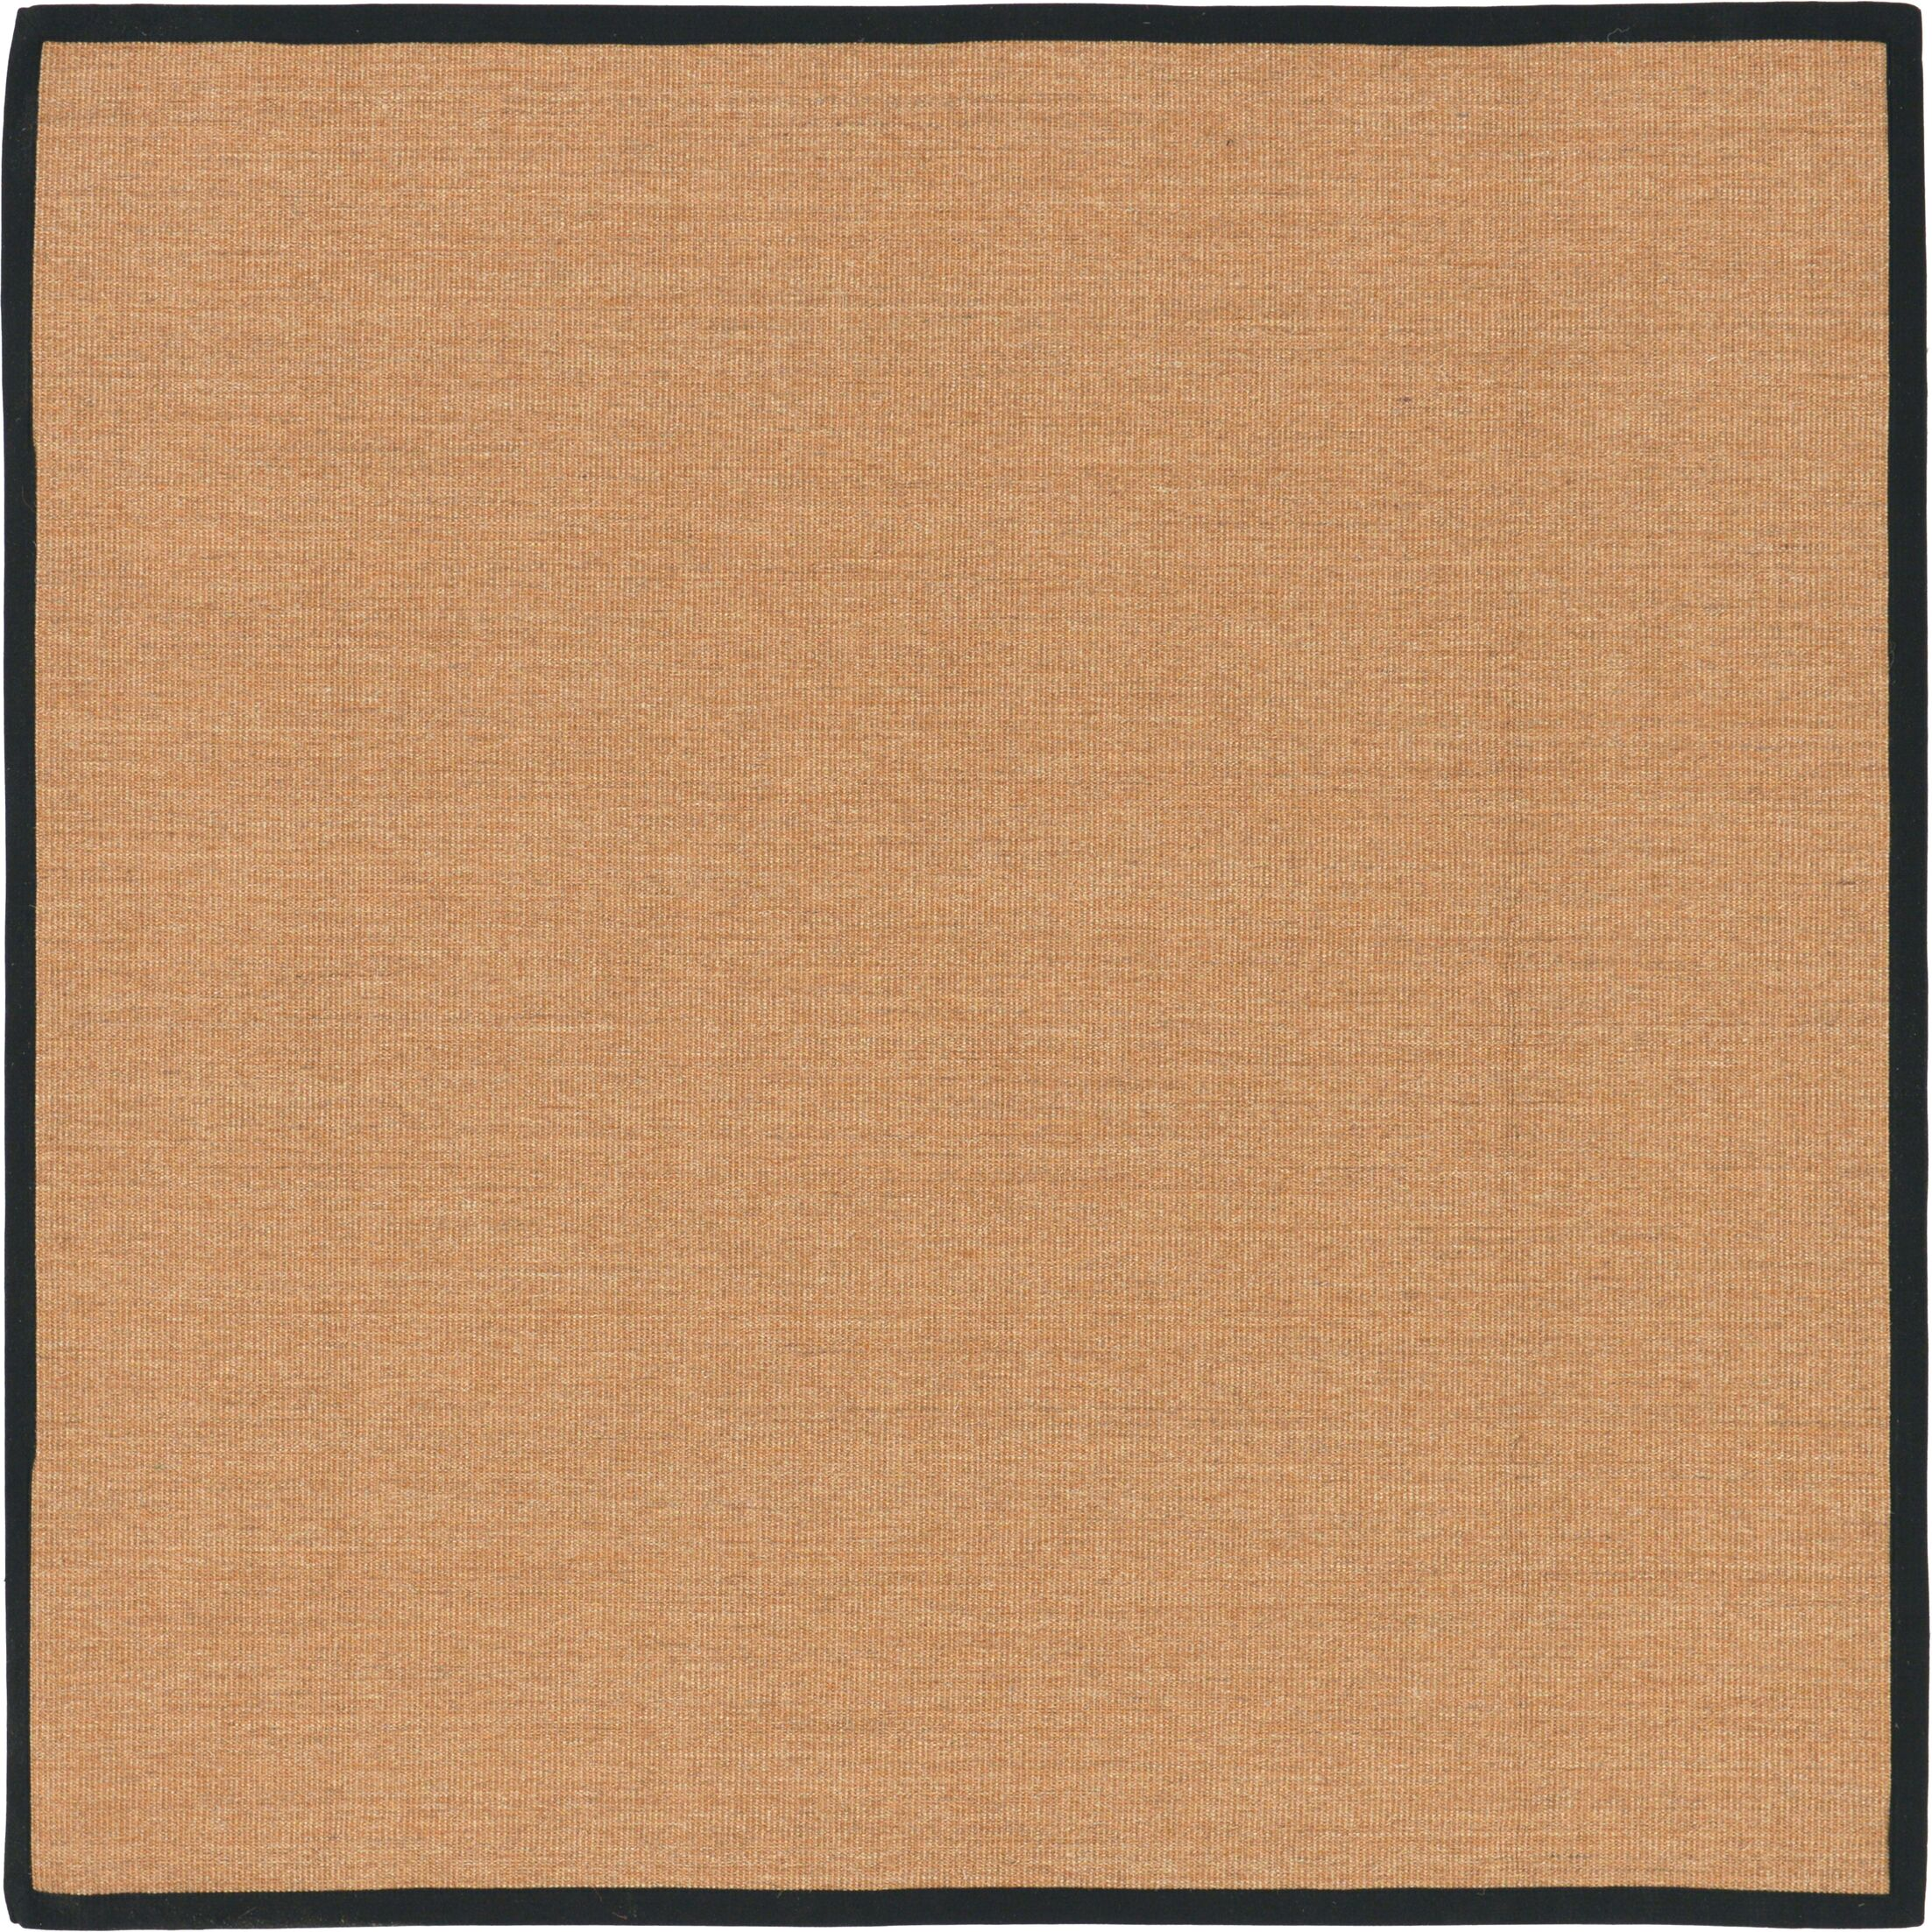 Grosvenor Light Brown Area Rug Rug Size: Square 8' x 8'